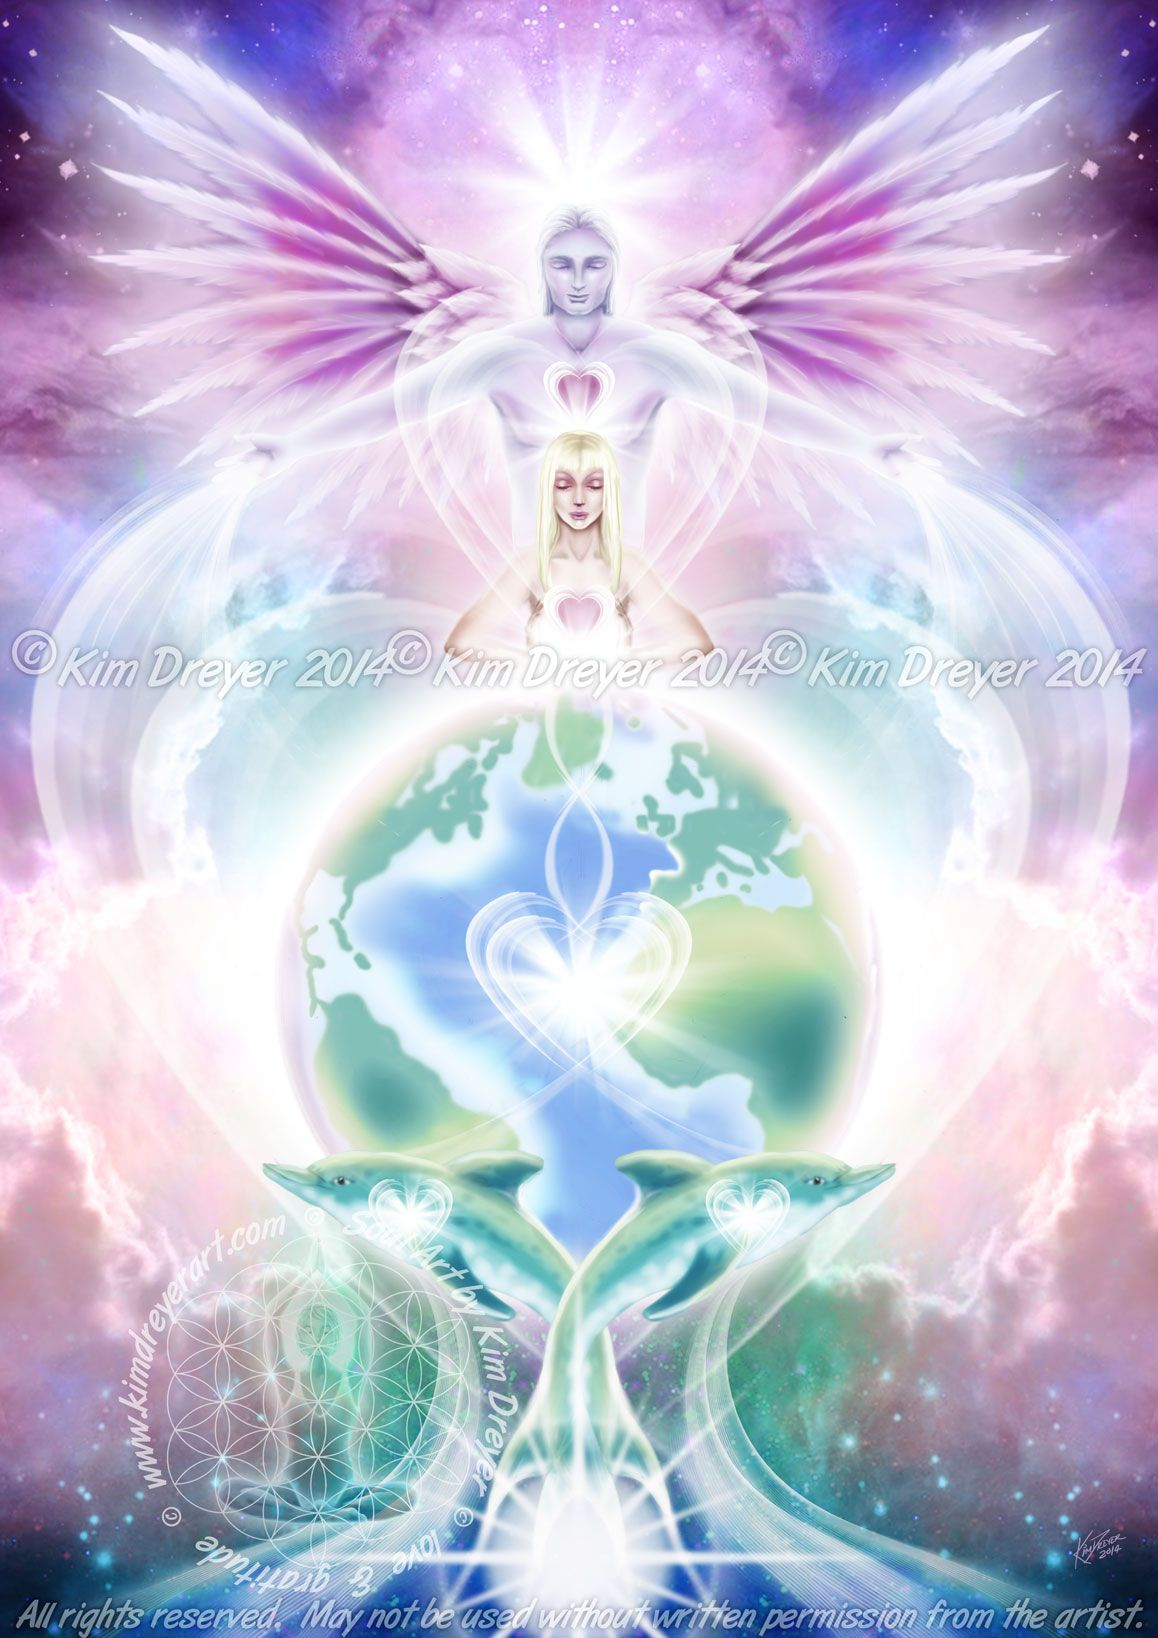 Universal Heart | Sacred Լight ಌ Kim Dreyer | Angel, Heart ...